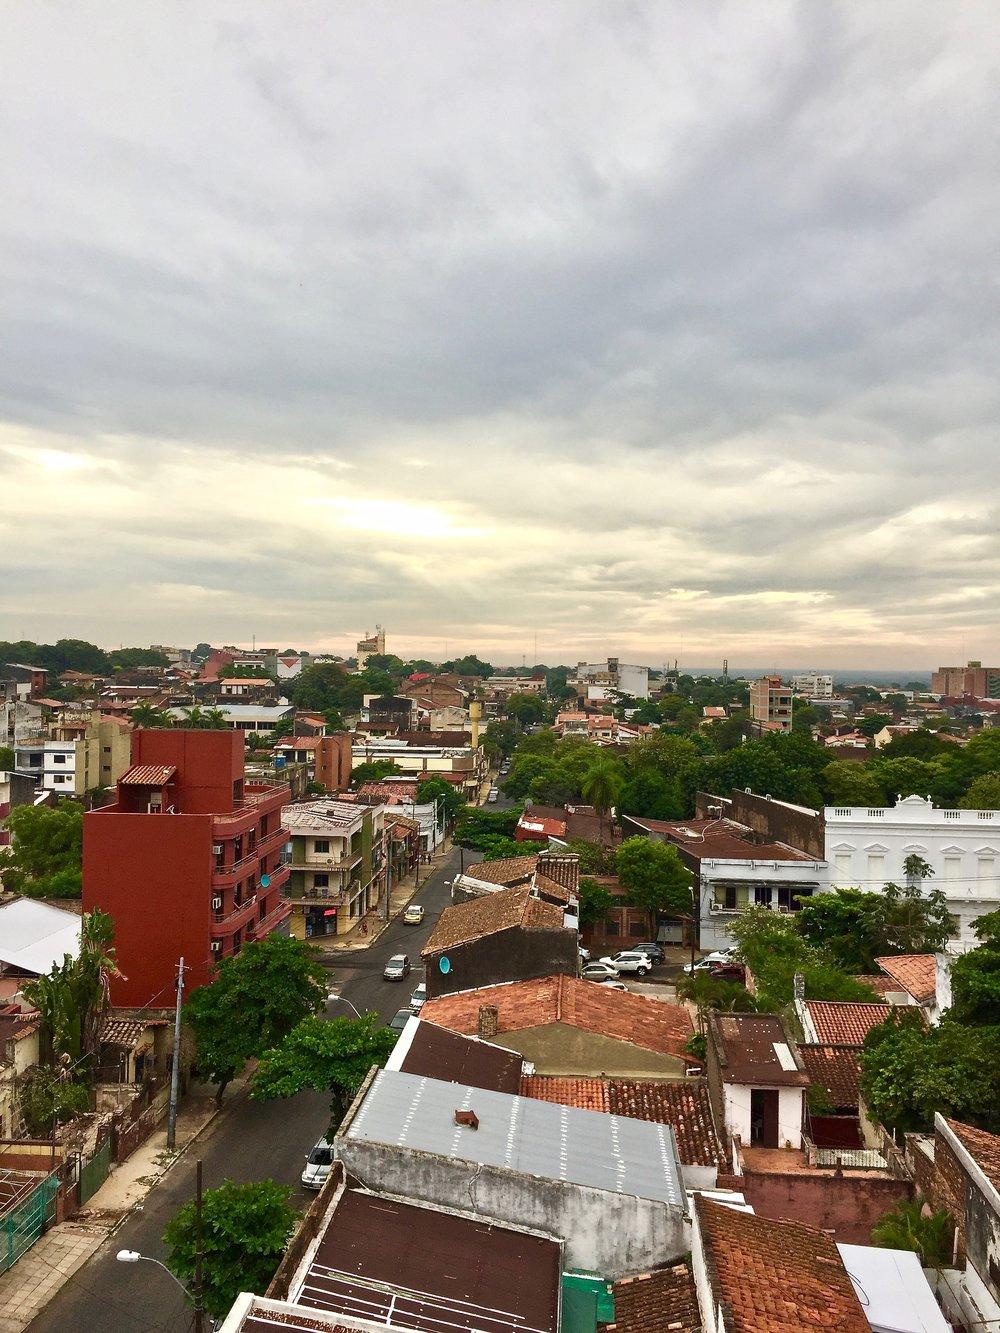 A view of Asuncíon, Paraguay